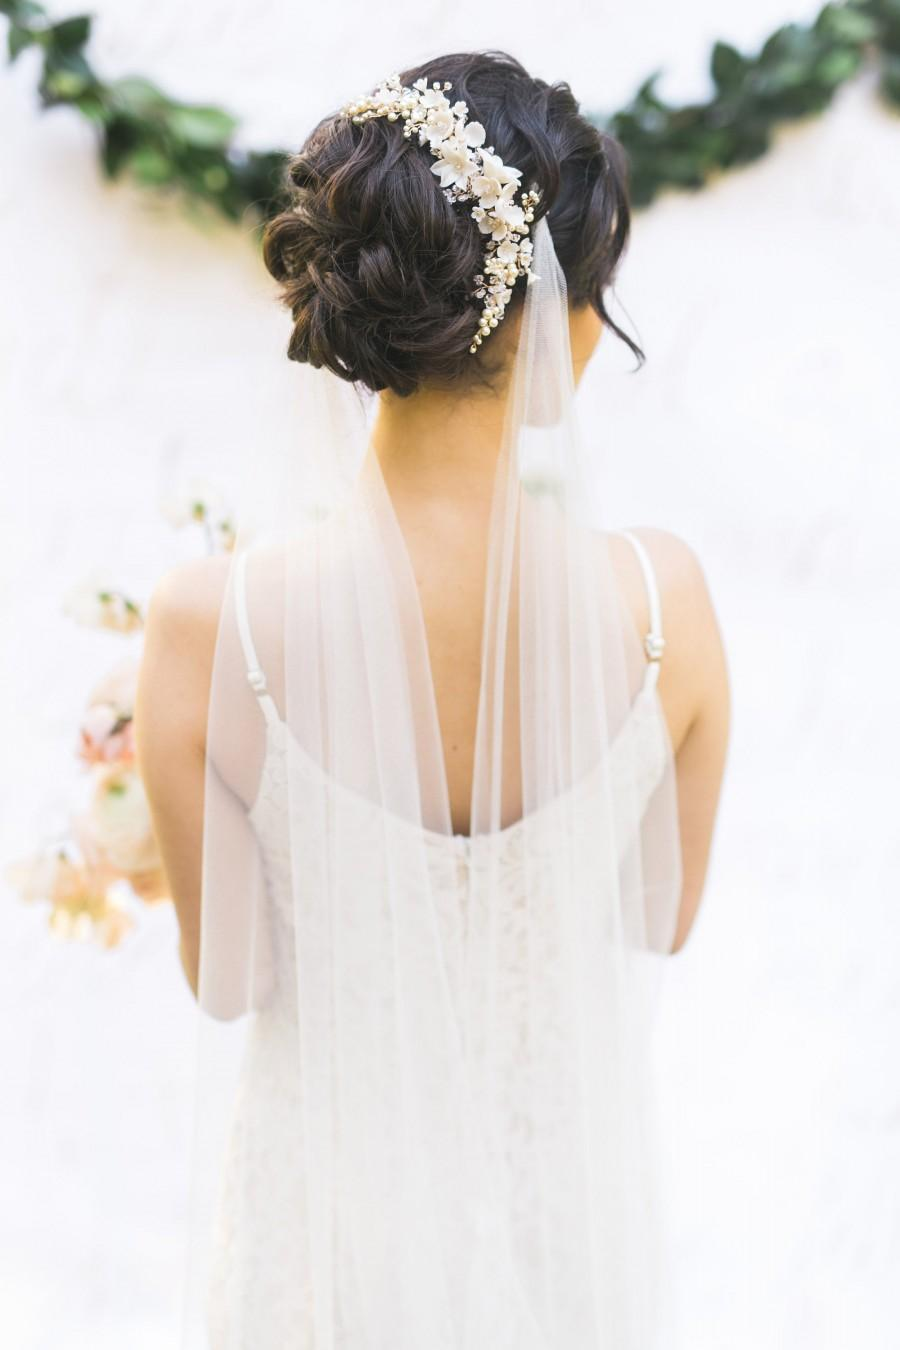 Hochzeit - Wedding Veil, Bridal Veil, Draped Veil, Draped Wedding Veil, Draped Bridal Veil, Long Veil, Ivory Veil, Ivory Draped Veil, White Draped Veil